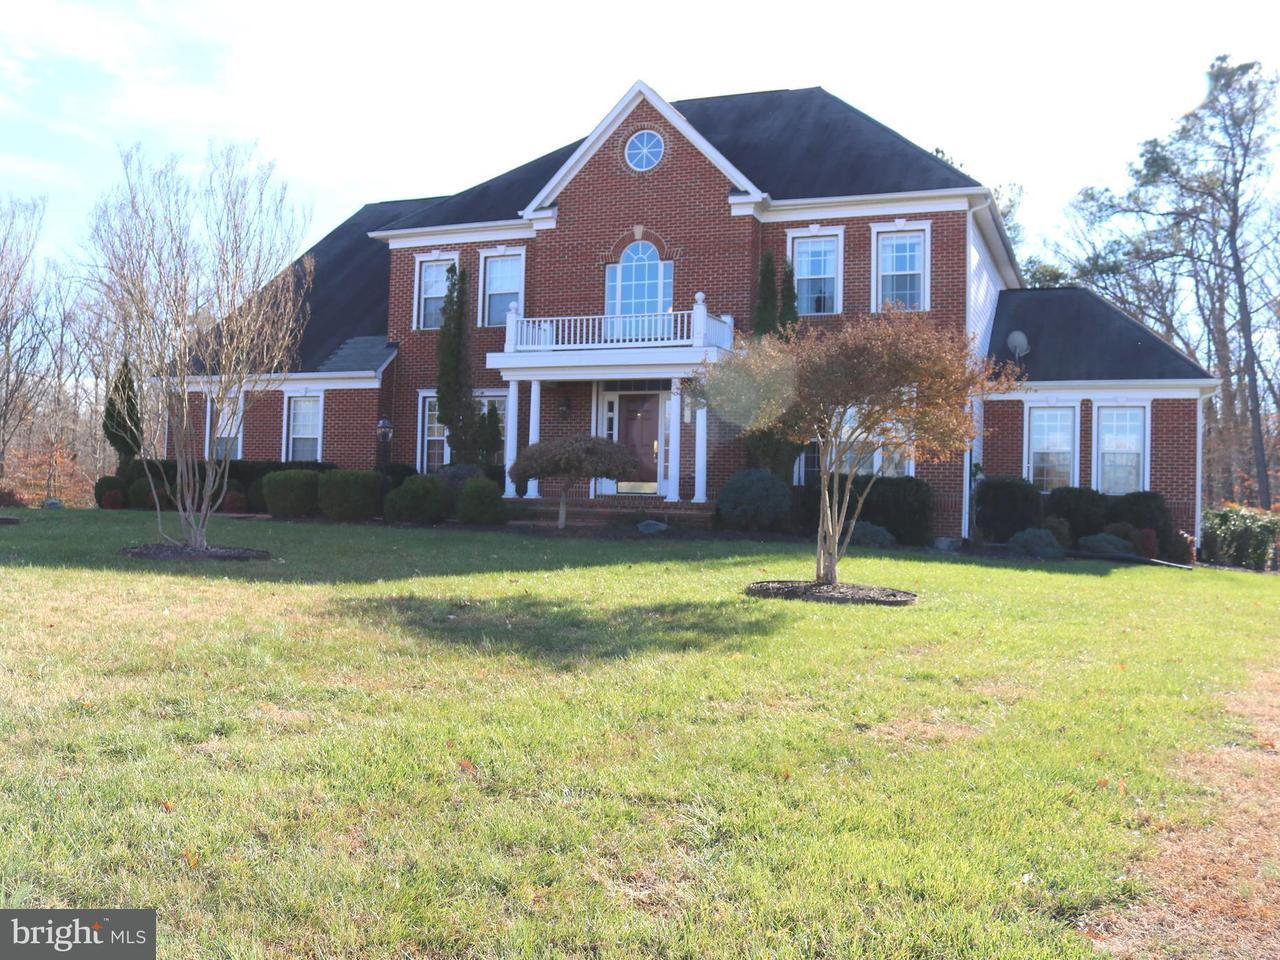 Single Family Home for Sale at 13806 CHESTNUT OAK Lane 13806 CHESTNUT OAK Lane Brandywine, Maryland 20613 United States